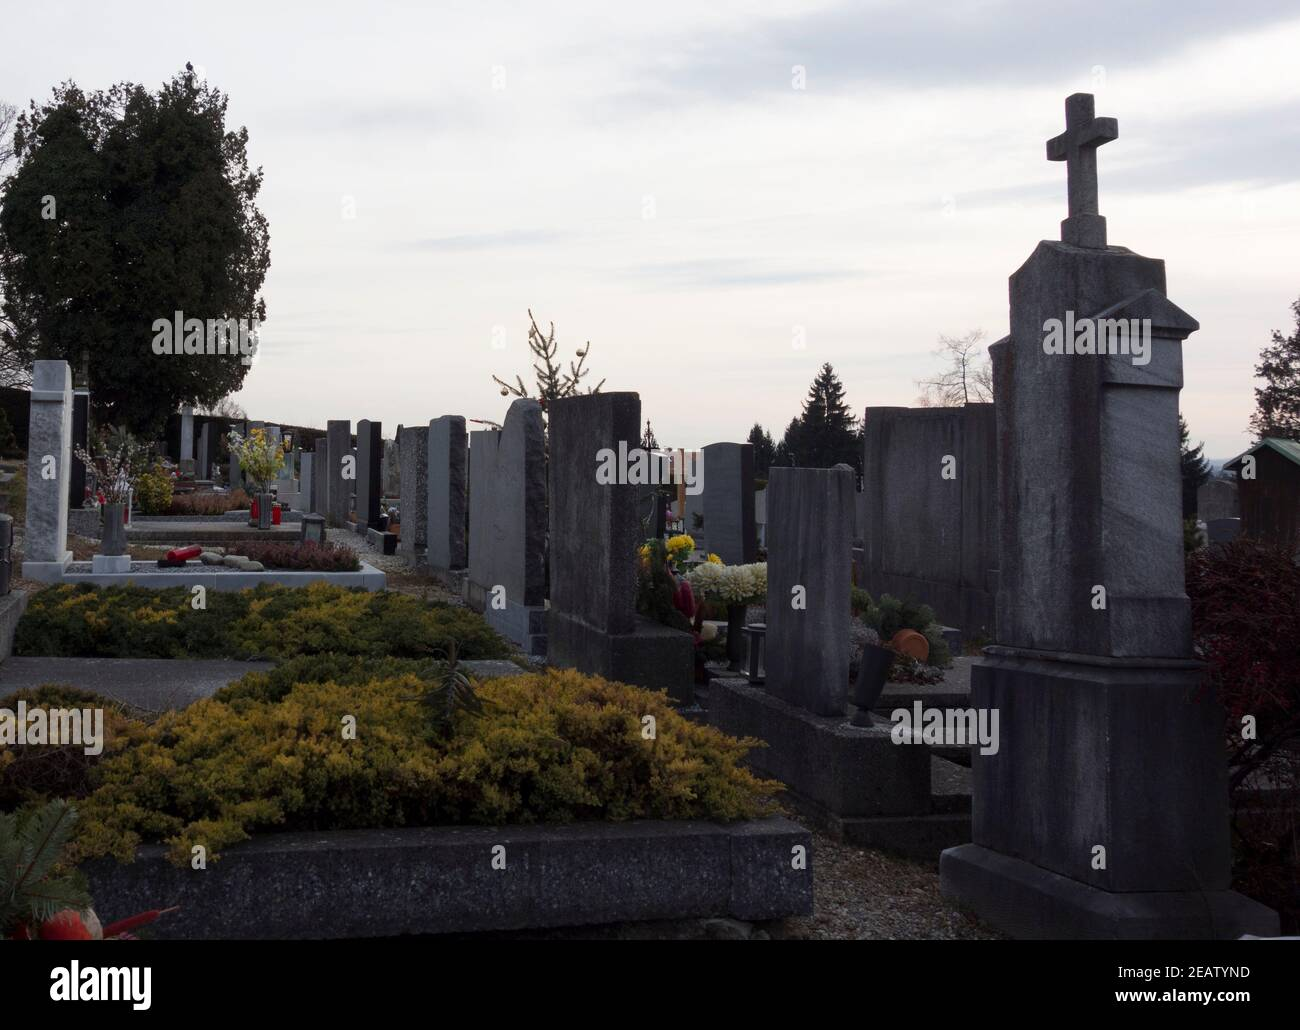 cementerio o cementerio donde están enterrados los muertos Foto de stock